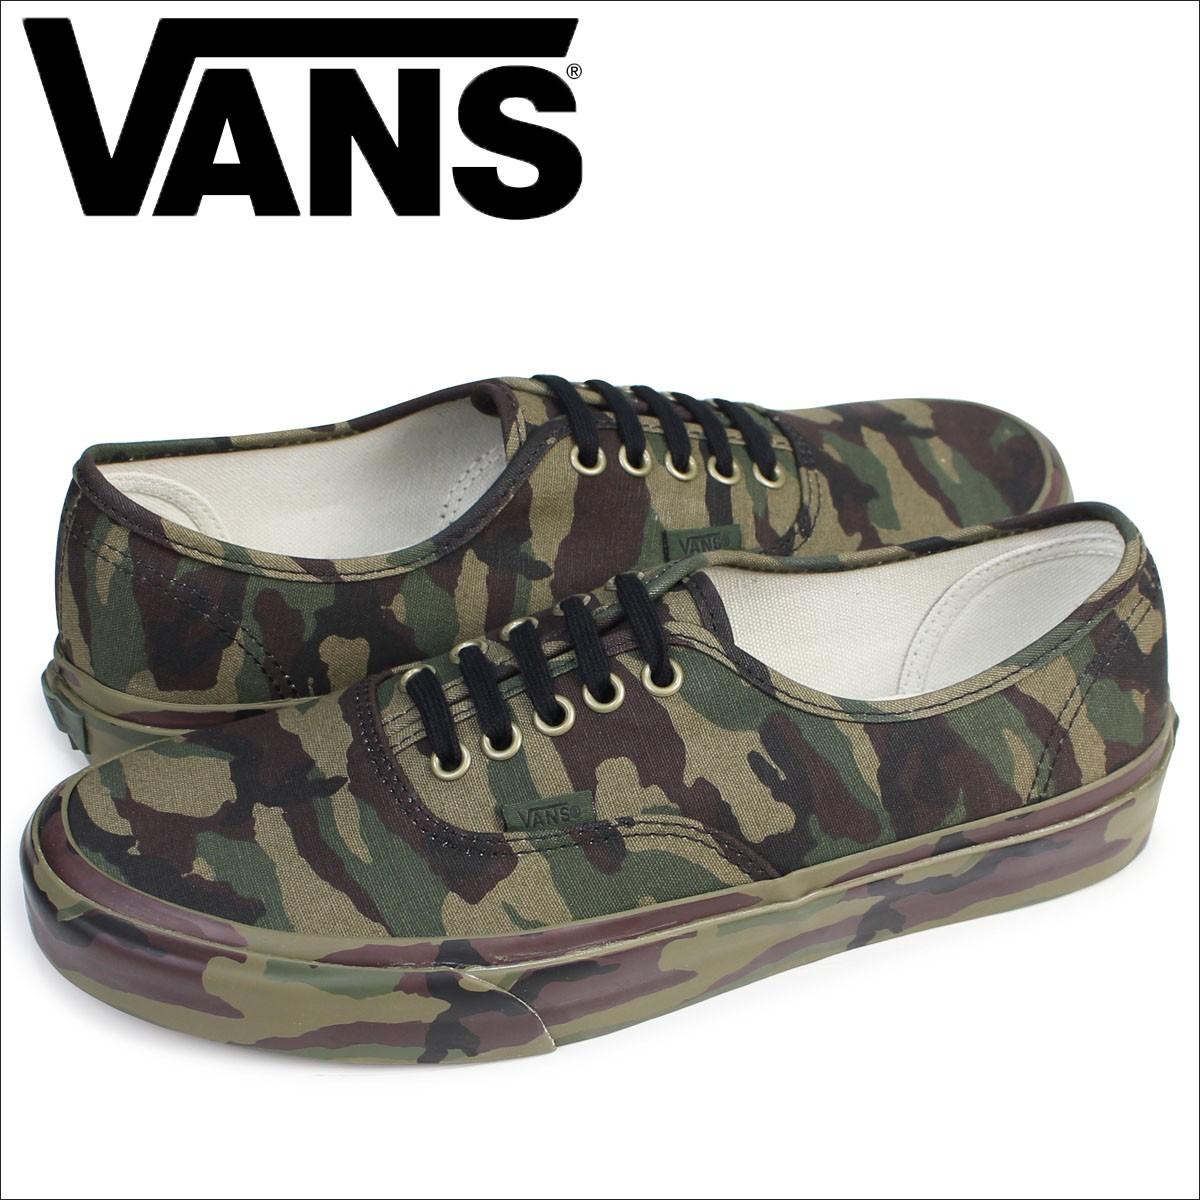 VANS オーセンティック スニーカー メンズ バンズ ヴァンズ AUTHENTIC MONO PRINT VN0A38EMOP3 靴 カモ